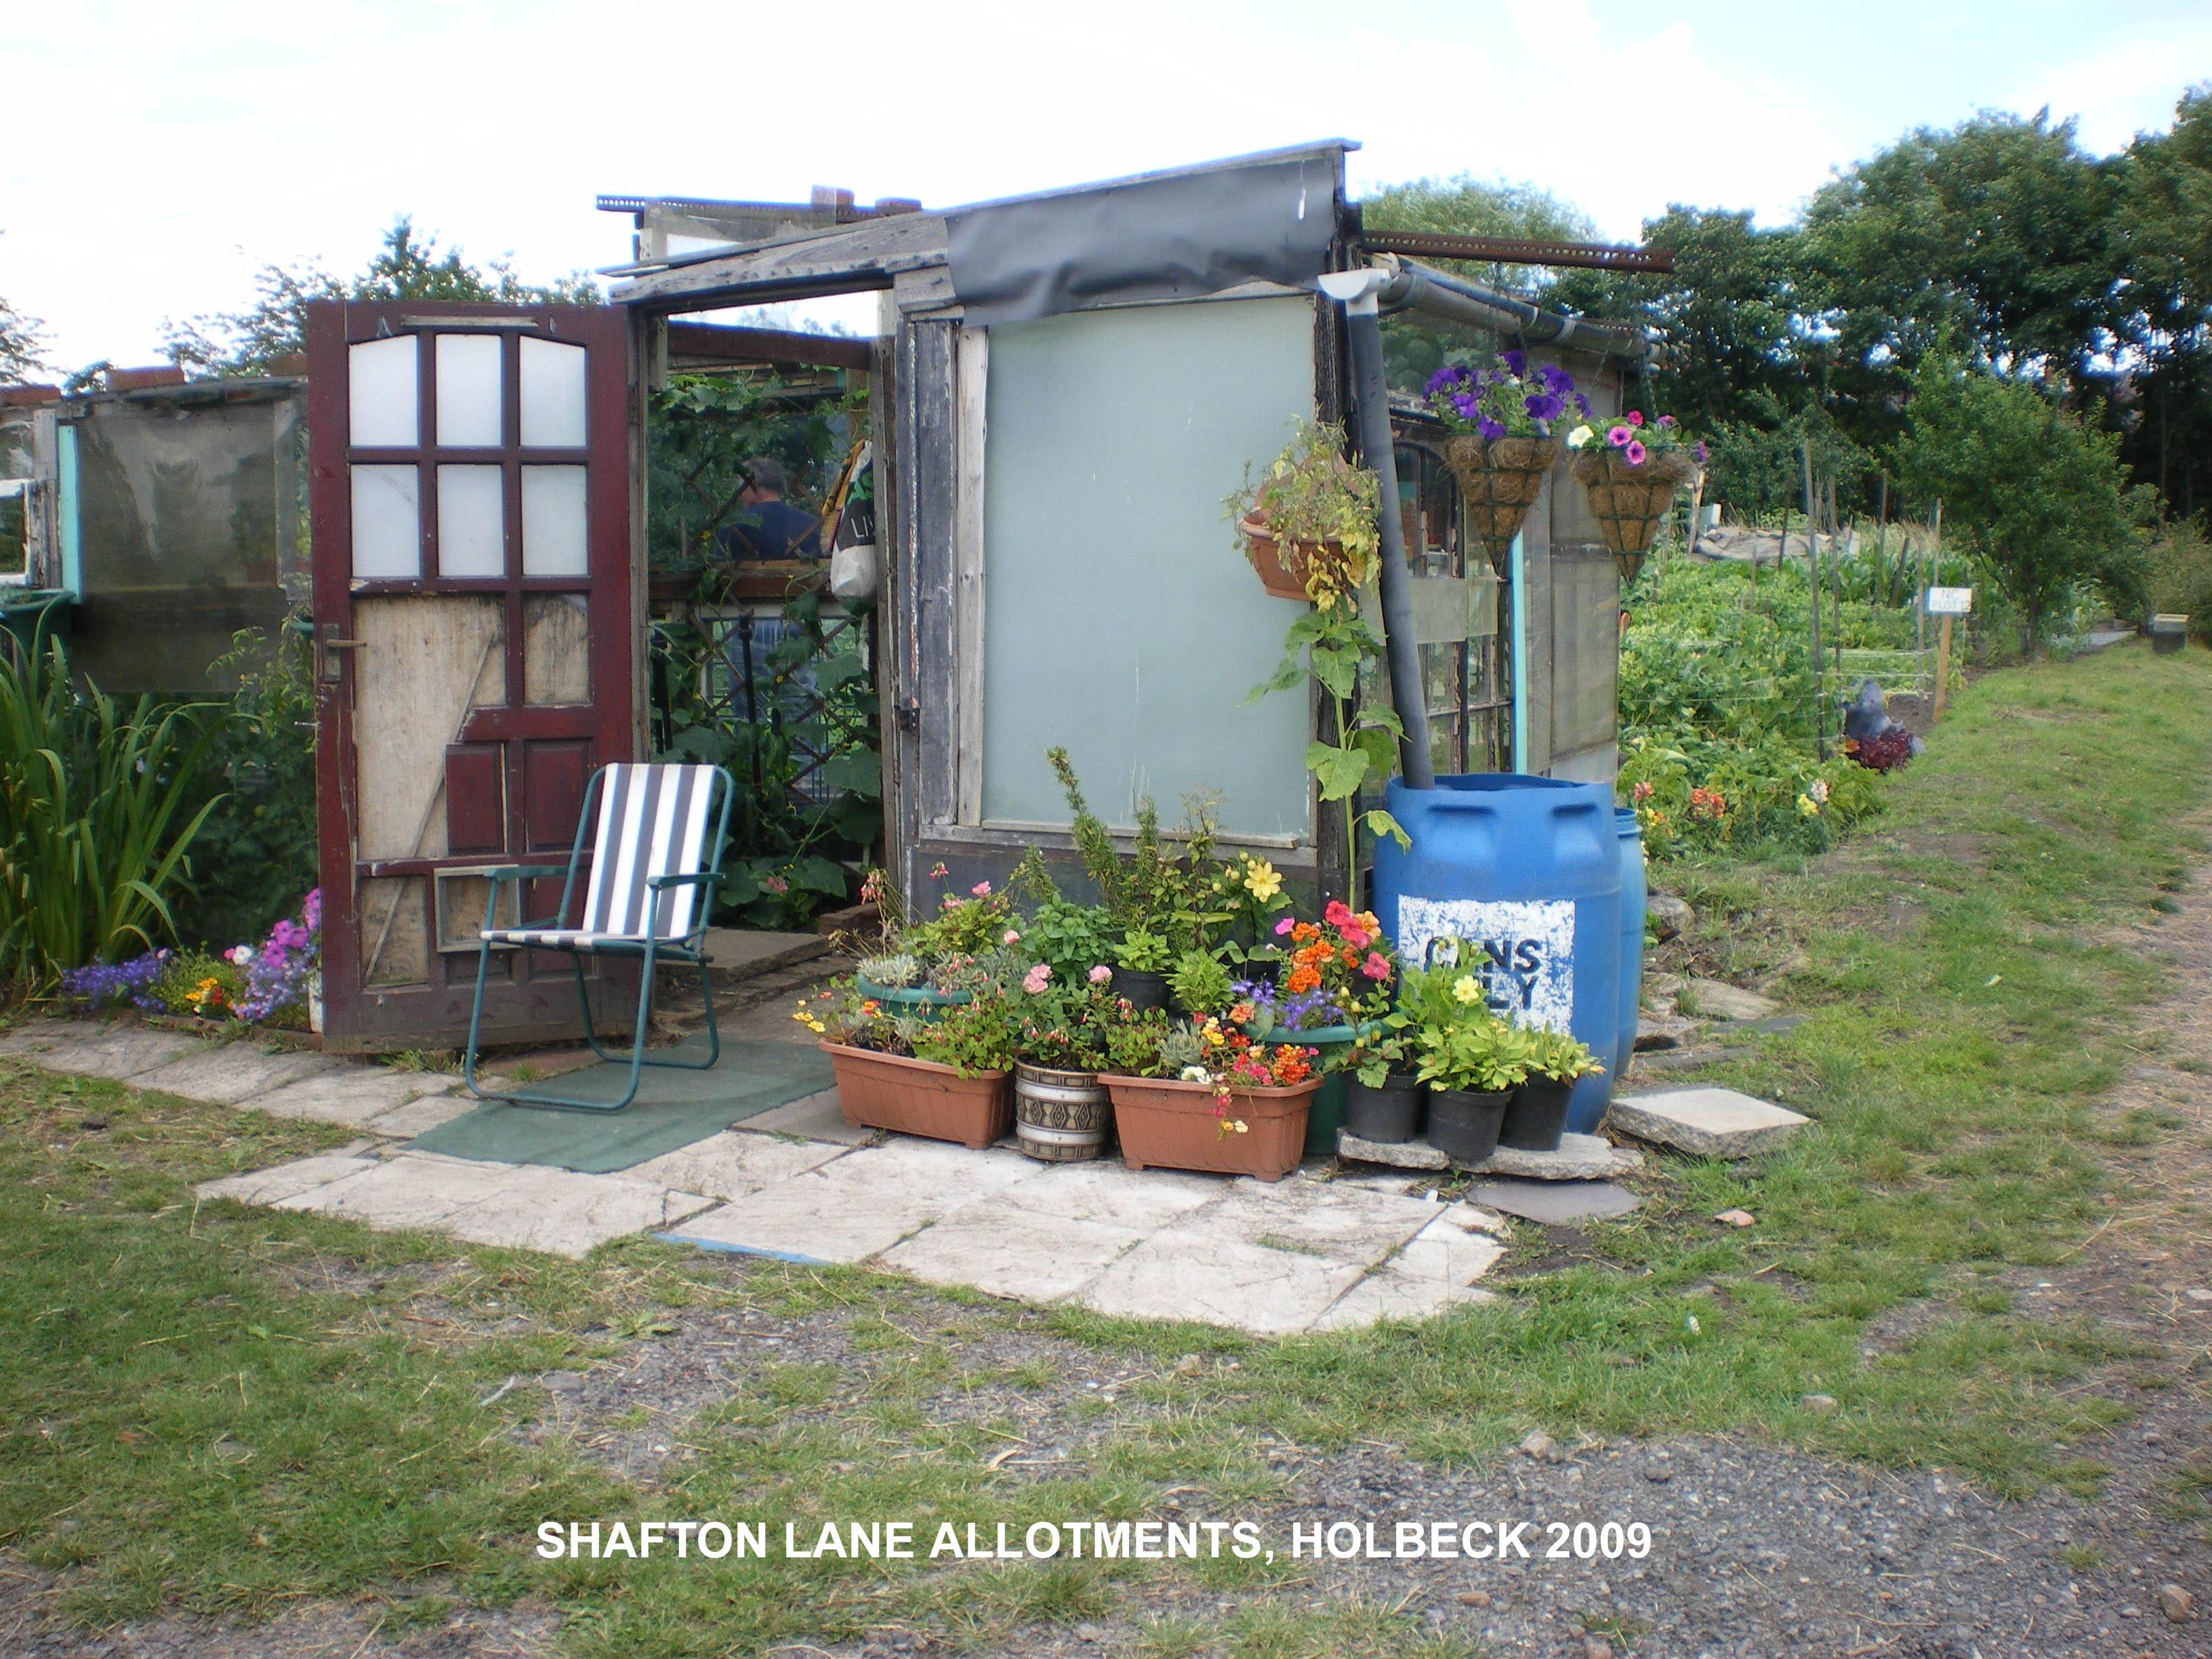 SHAFTON-LN2009